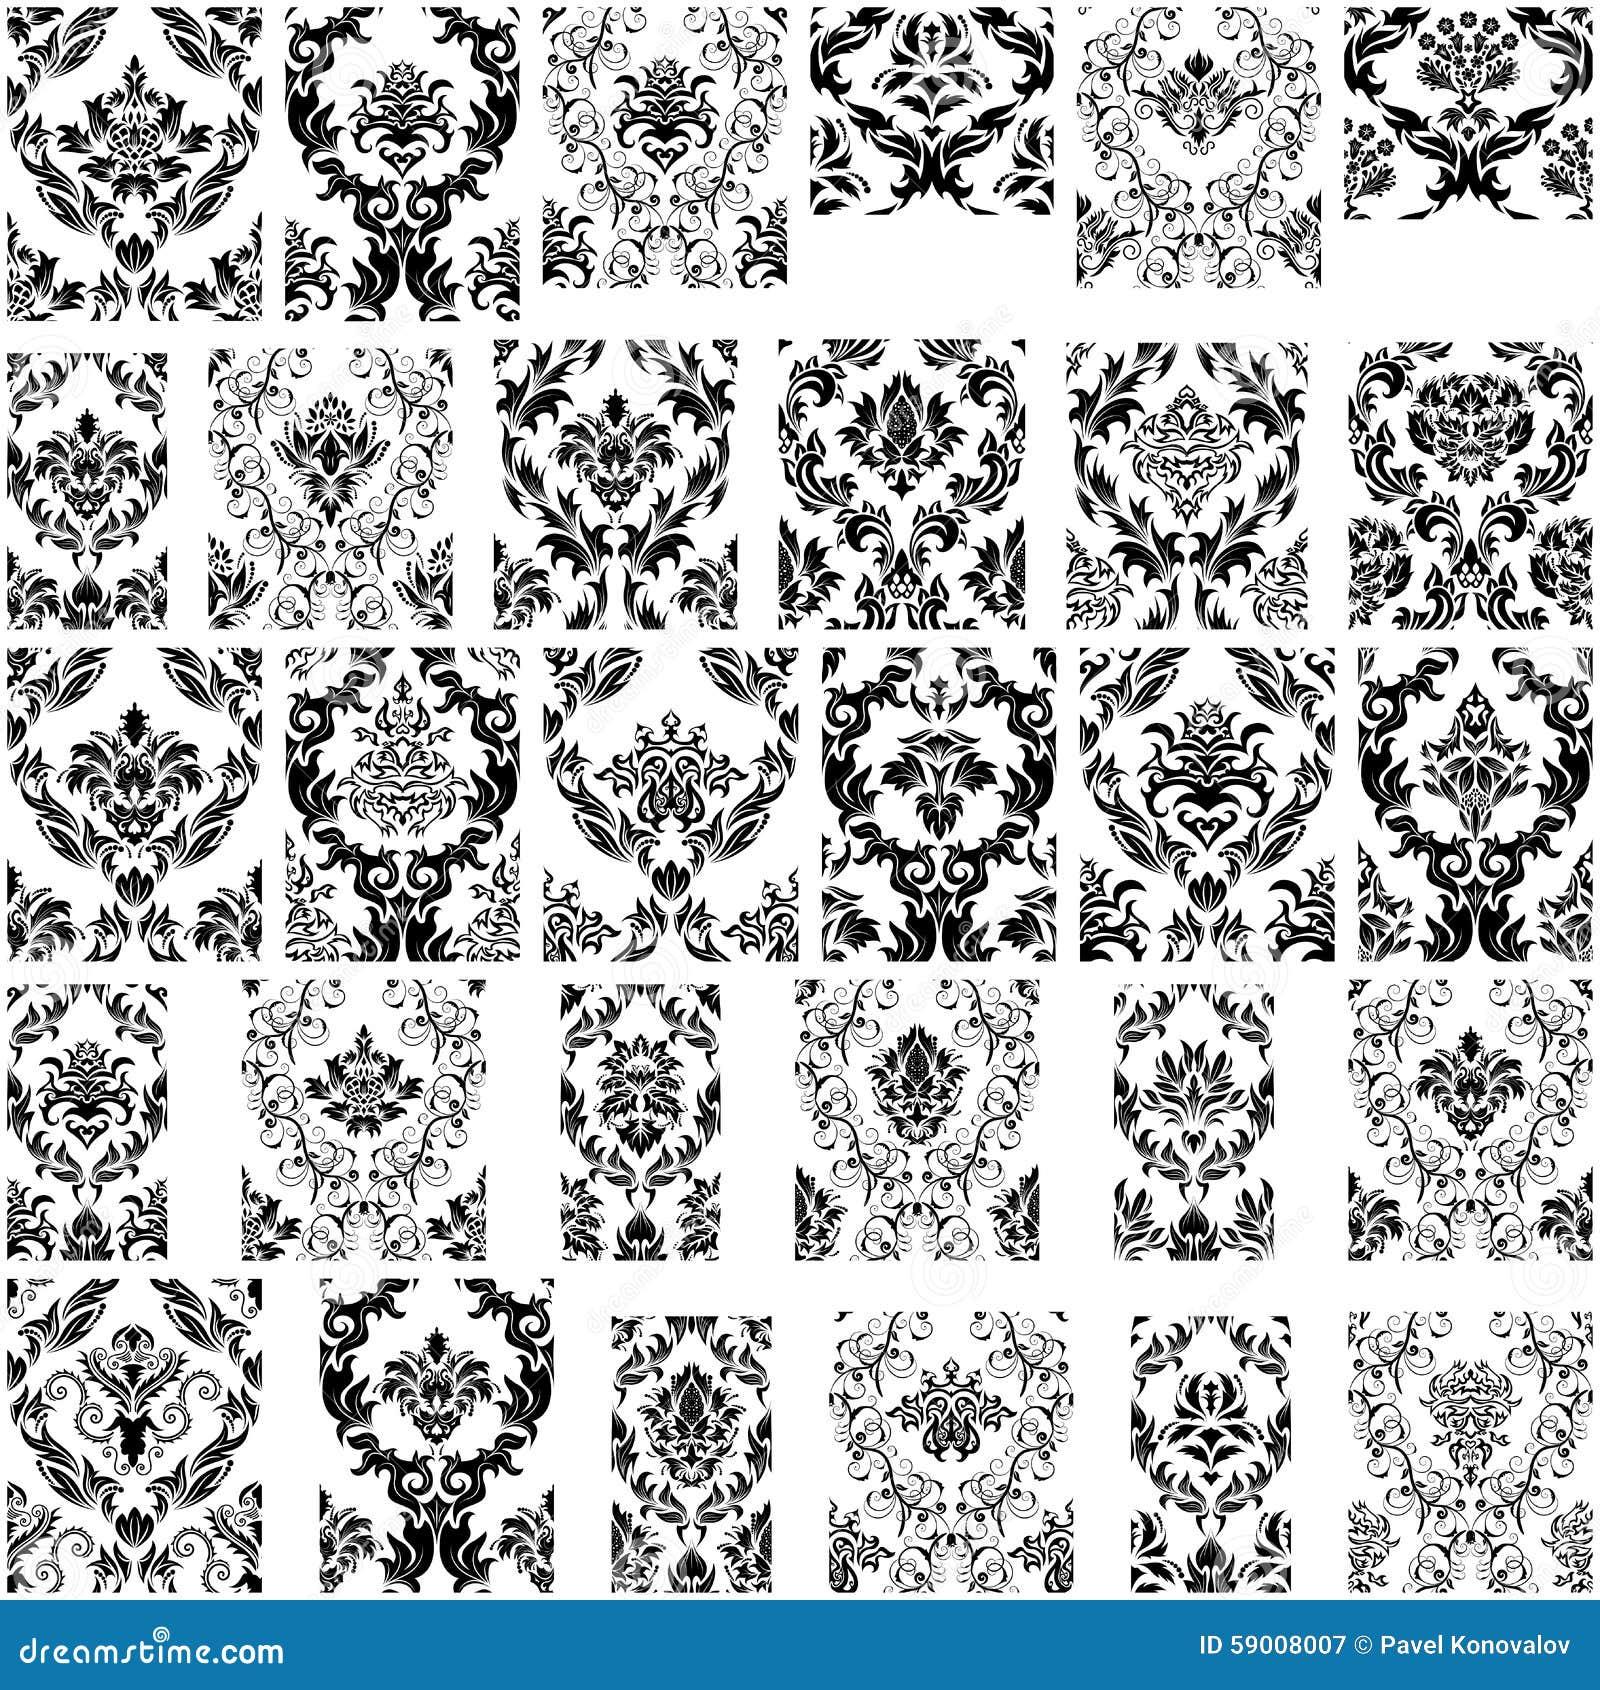 swirling royal pattern wallpaper - photo #29